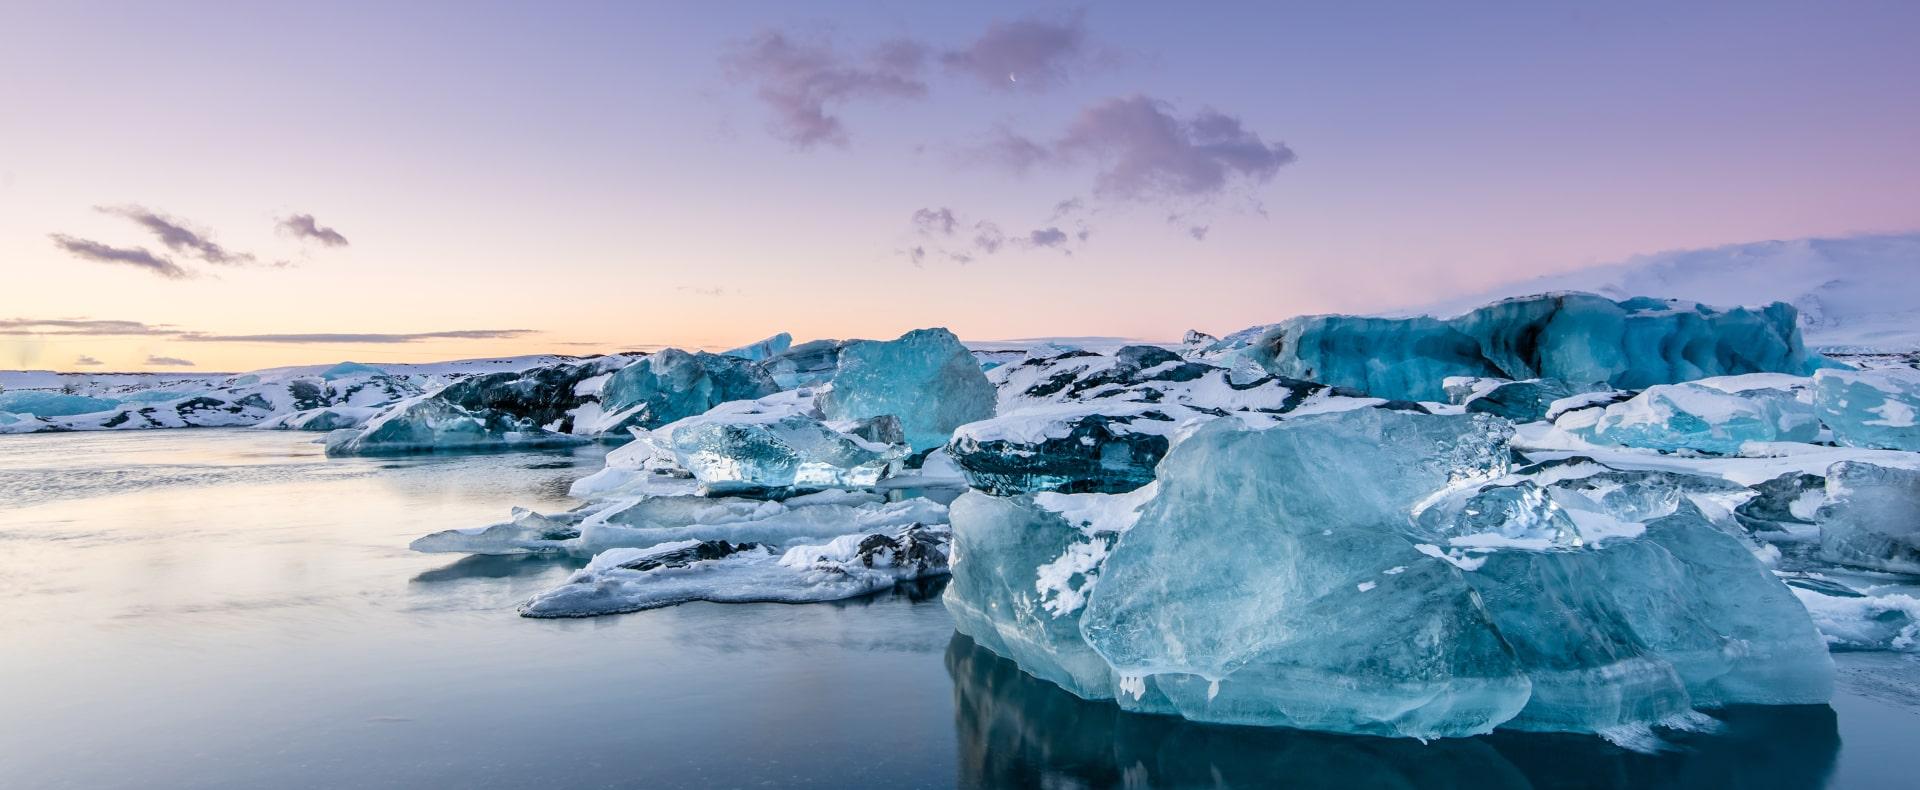 Hnappavellir, Iceland